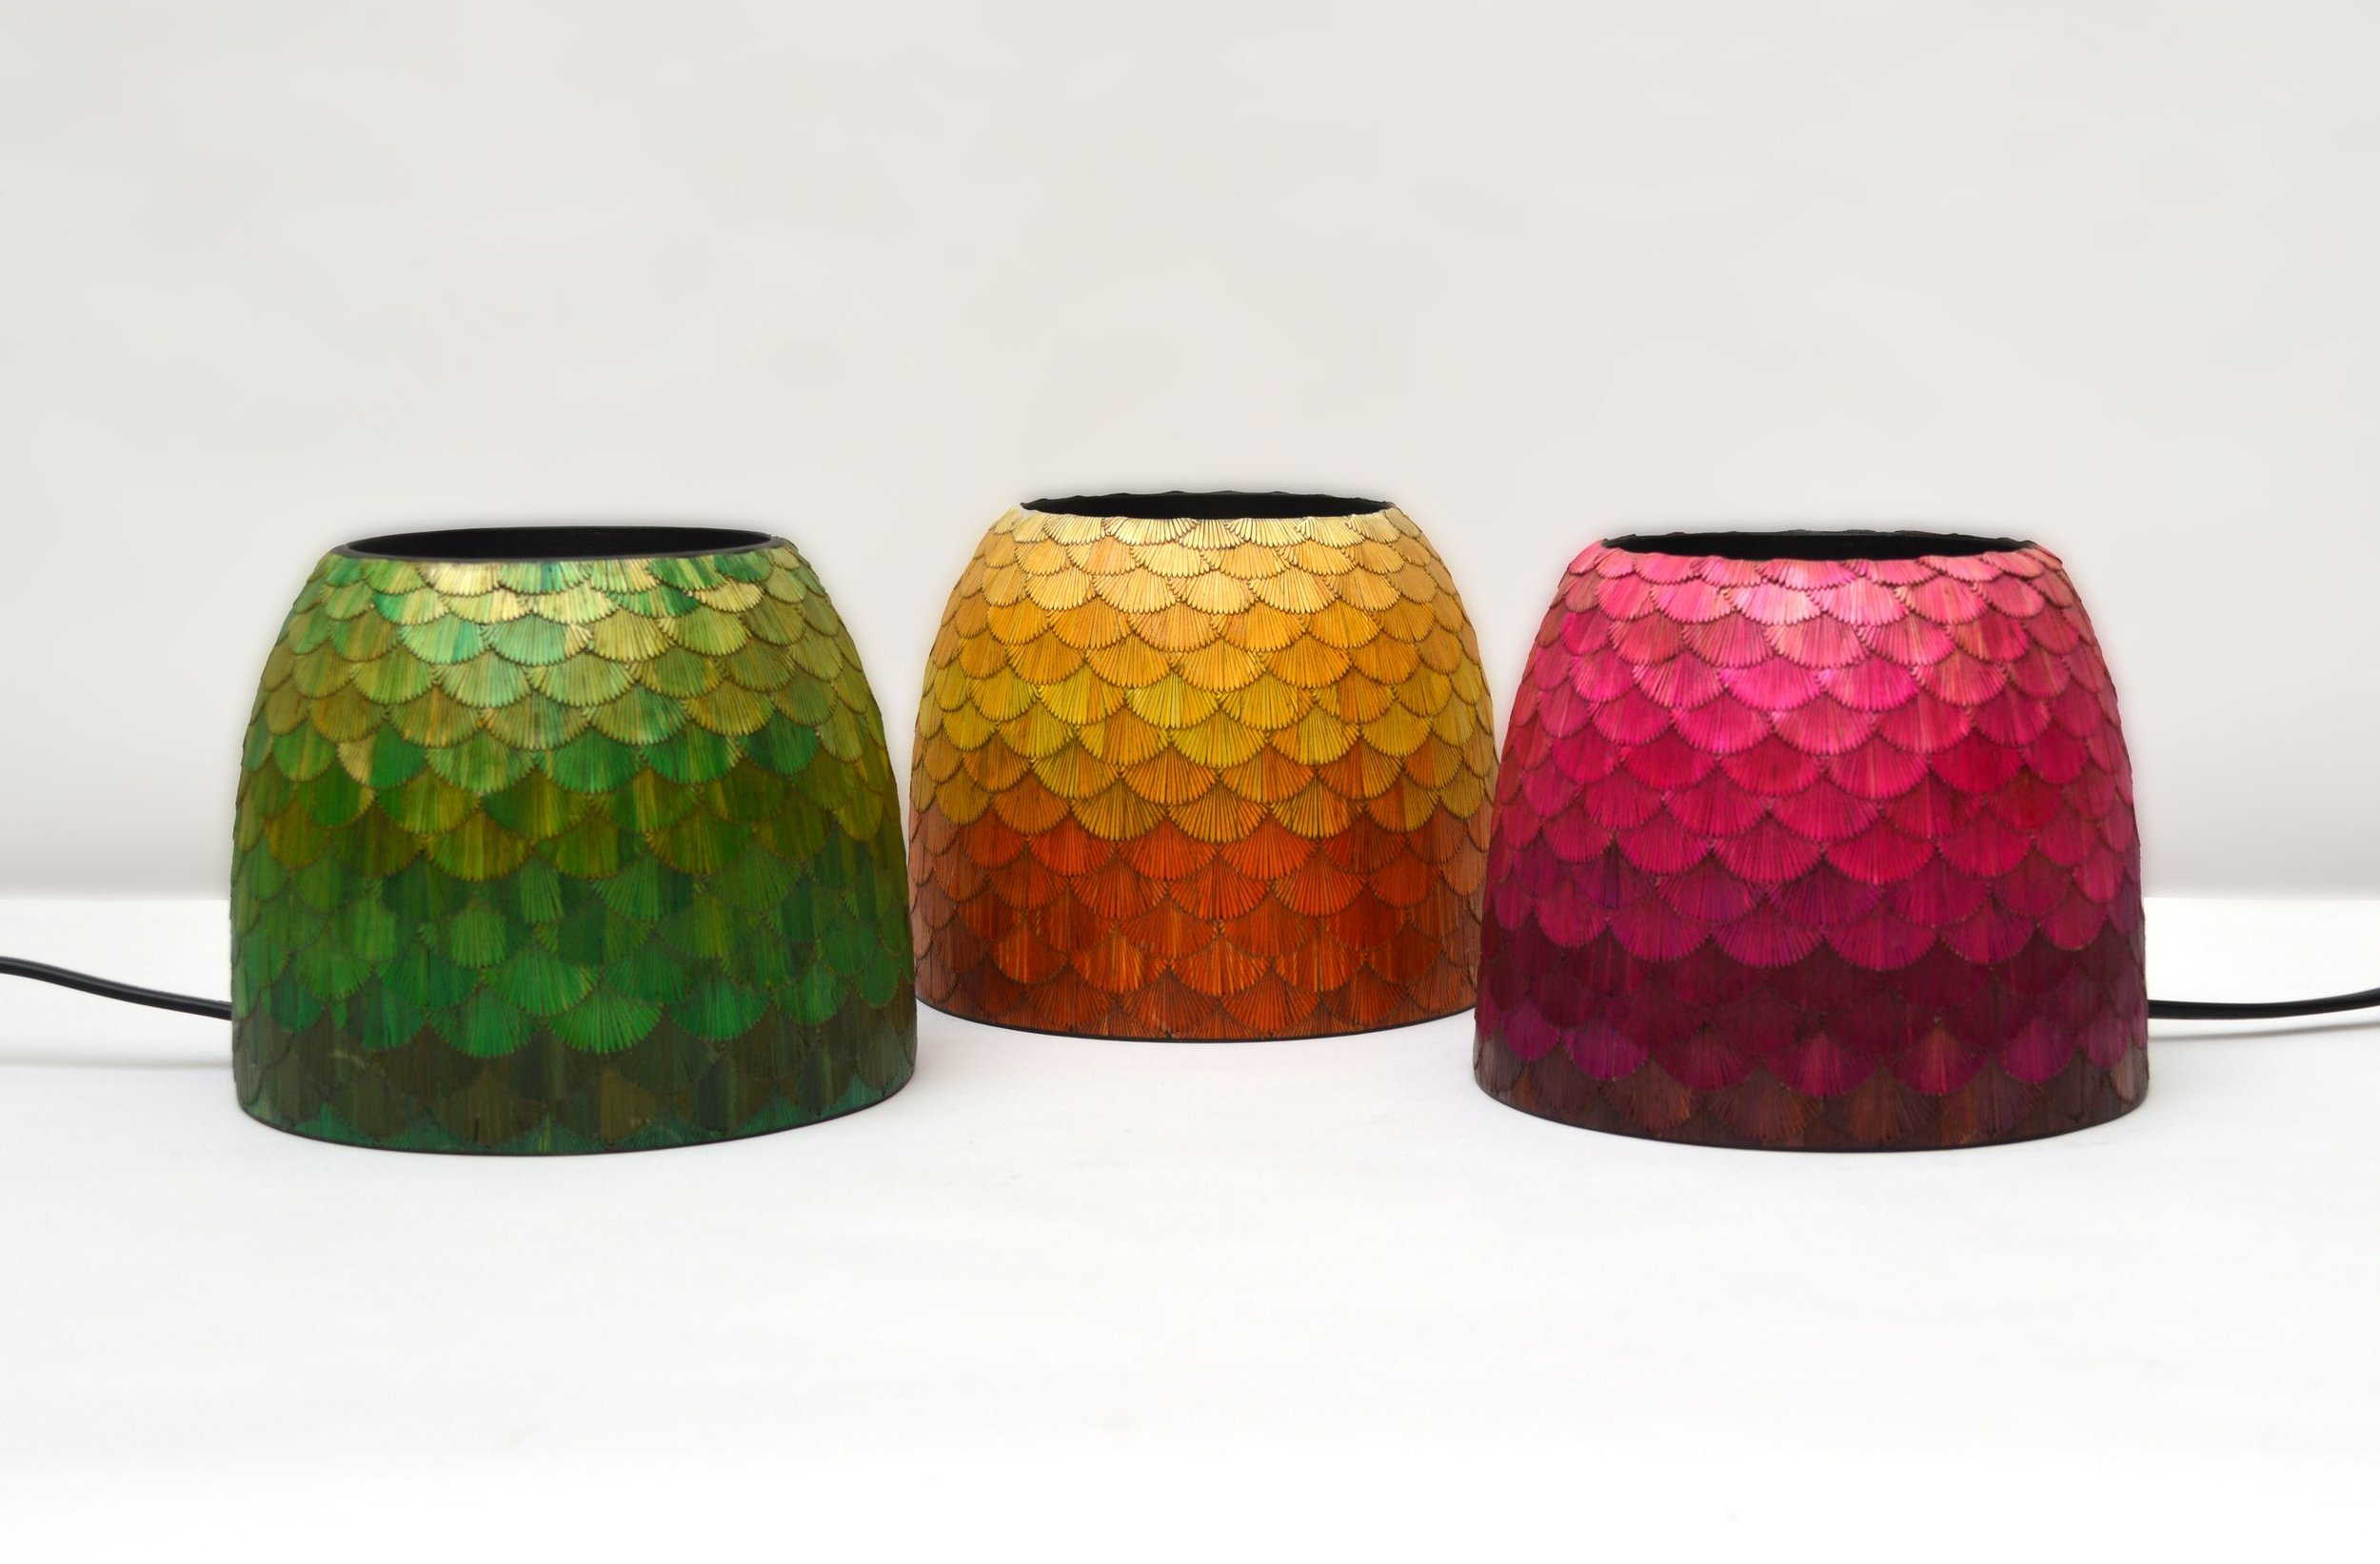 Lamps by Jose Dueñas.